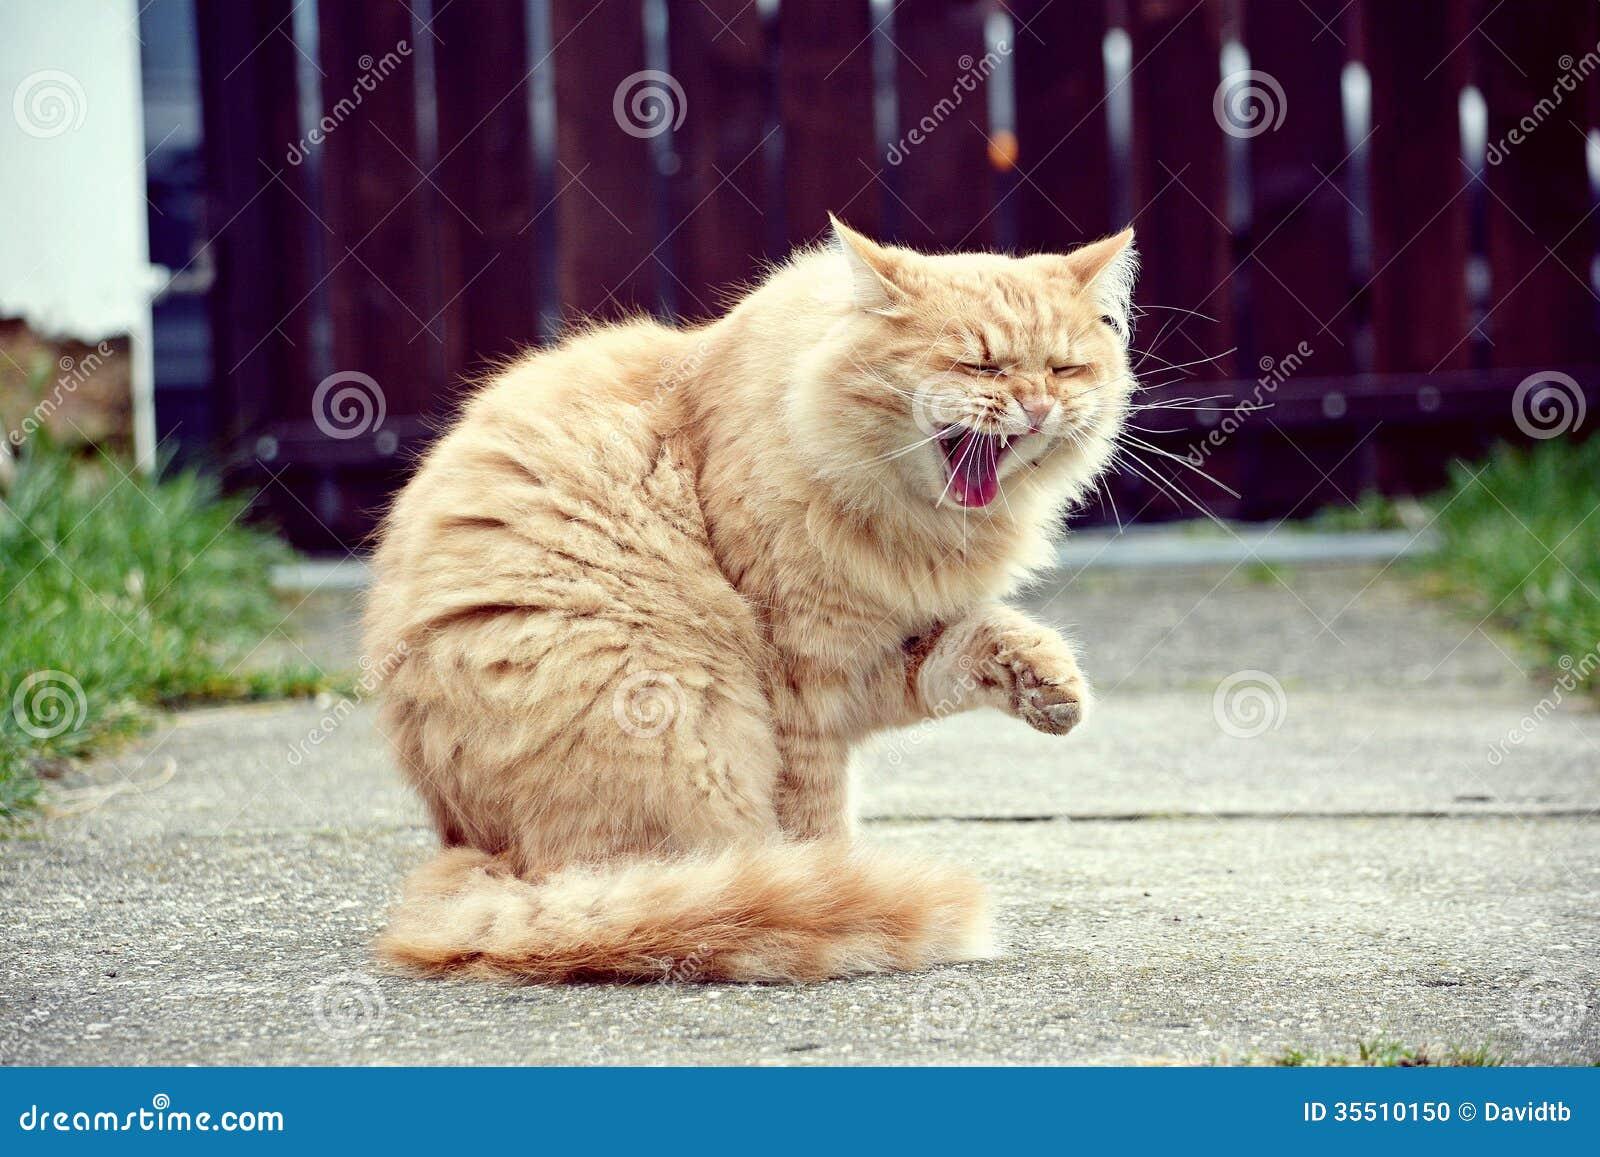 Funny Cat Stock Photo Image 35510150